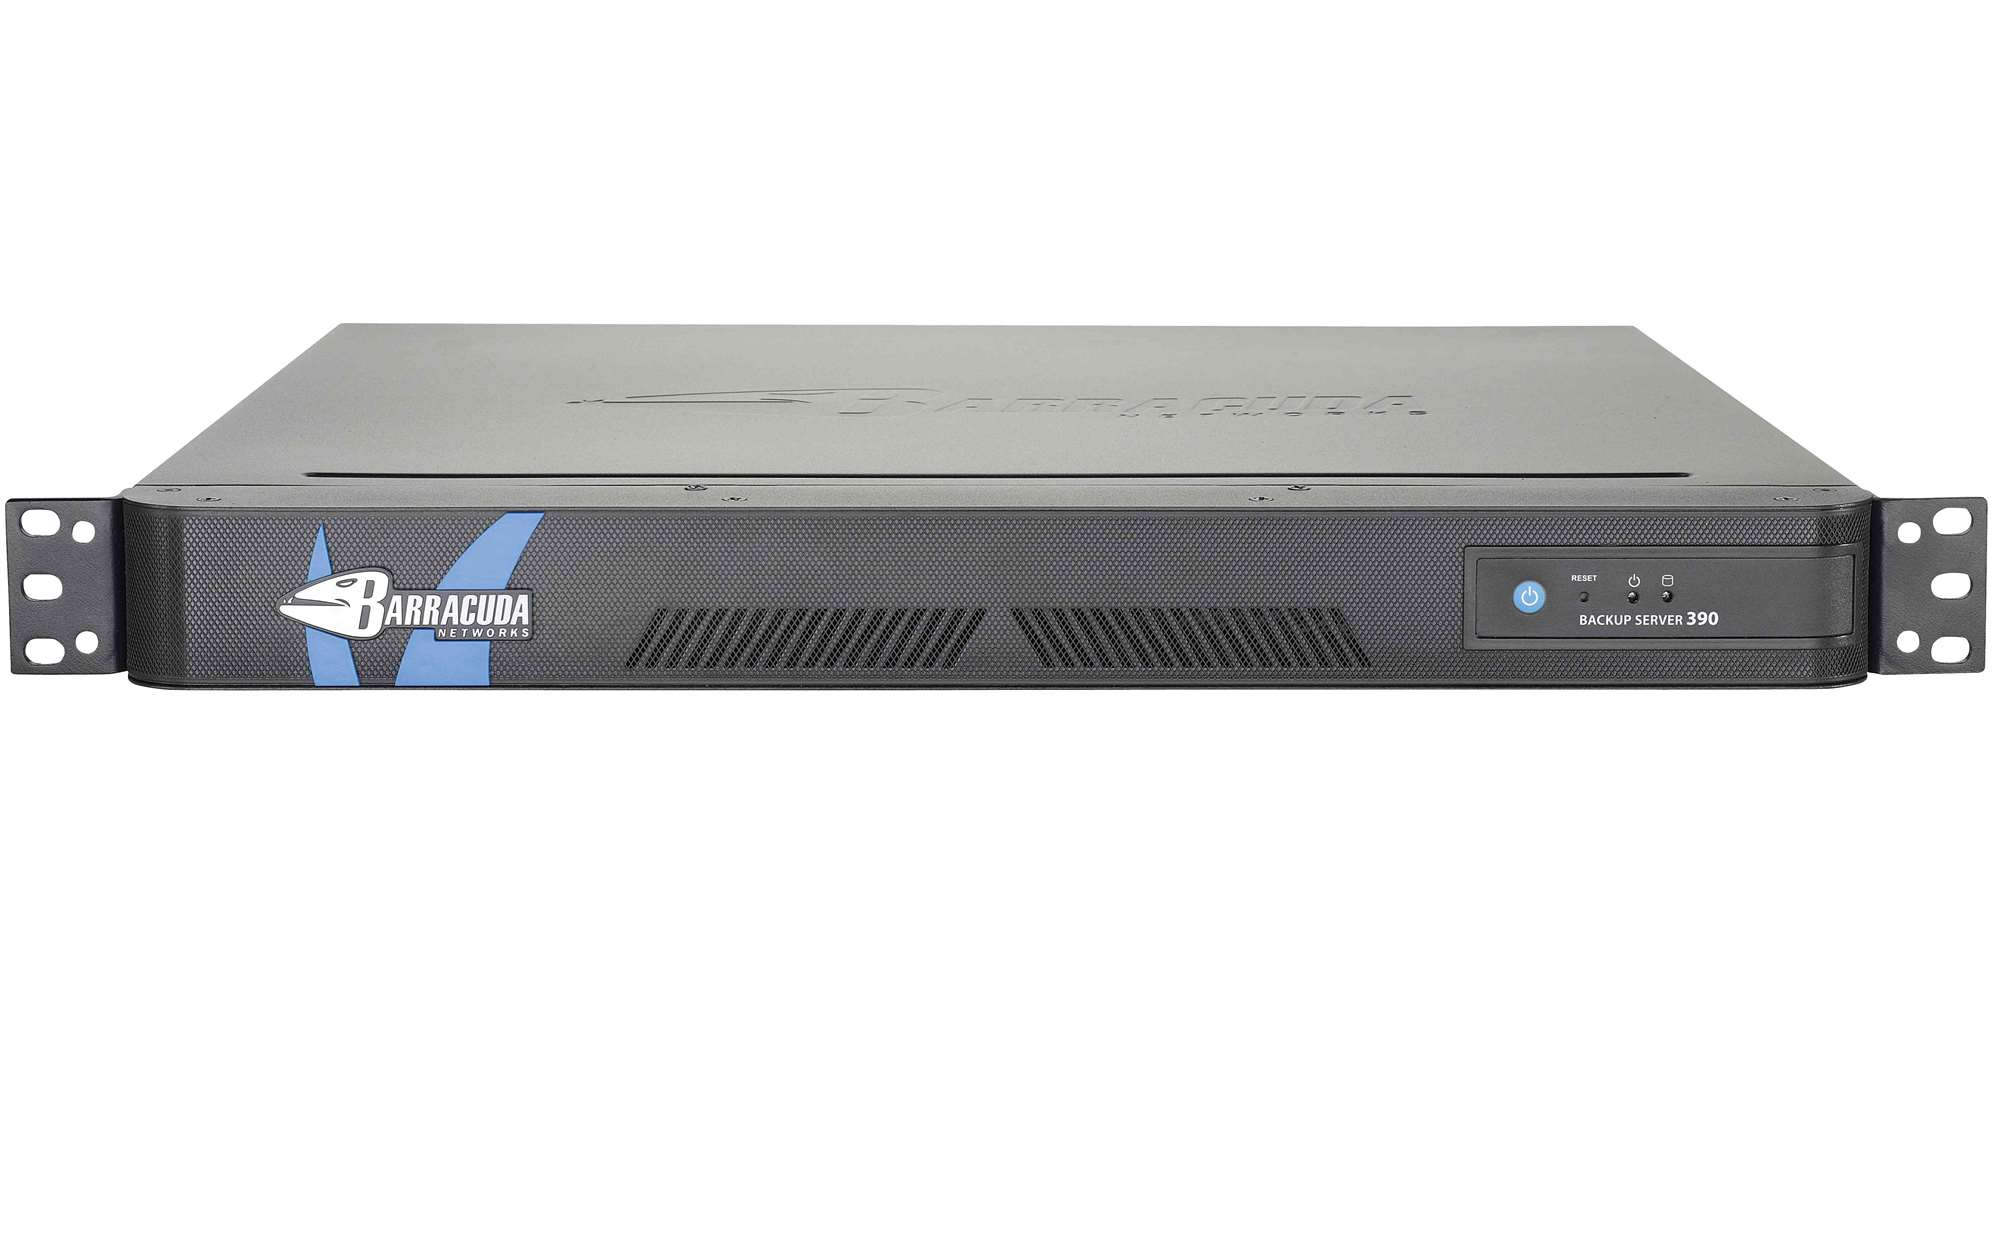 Barracuda Backup Server 390 Hardware Servers Amp Storage